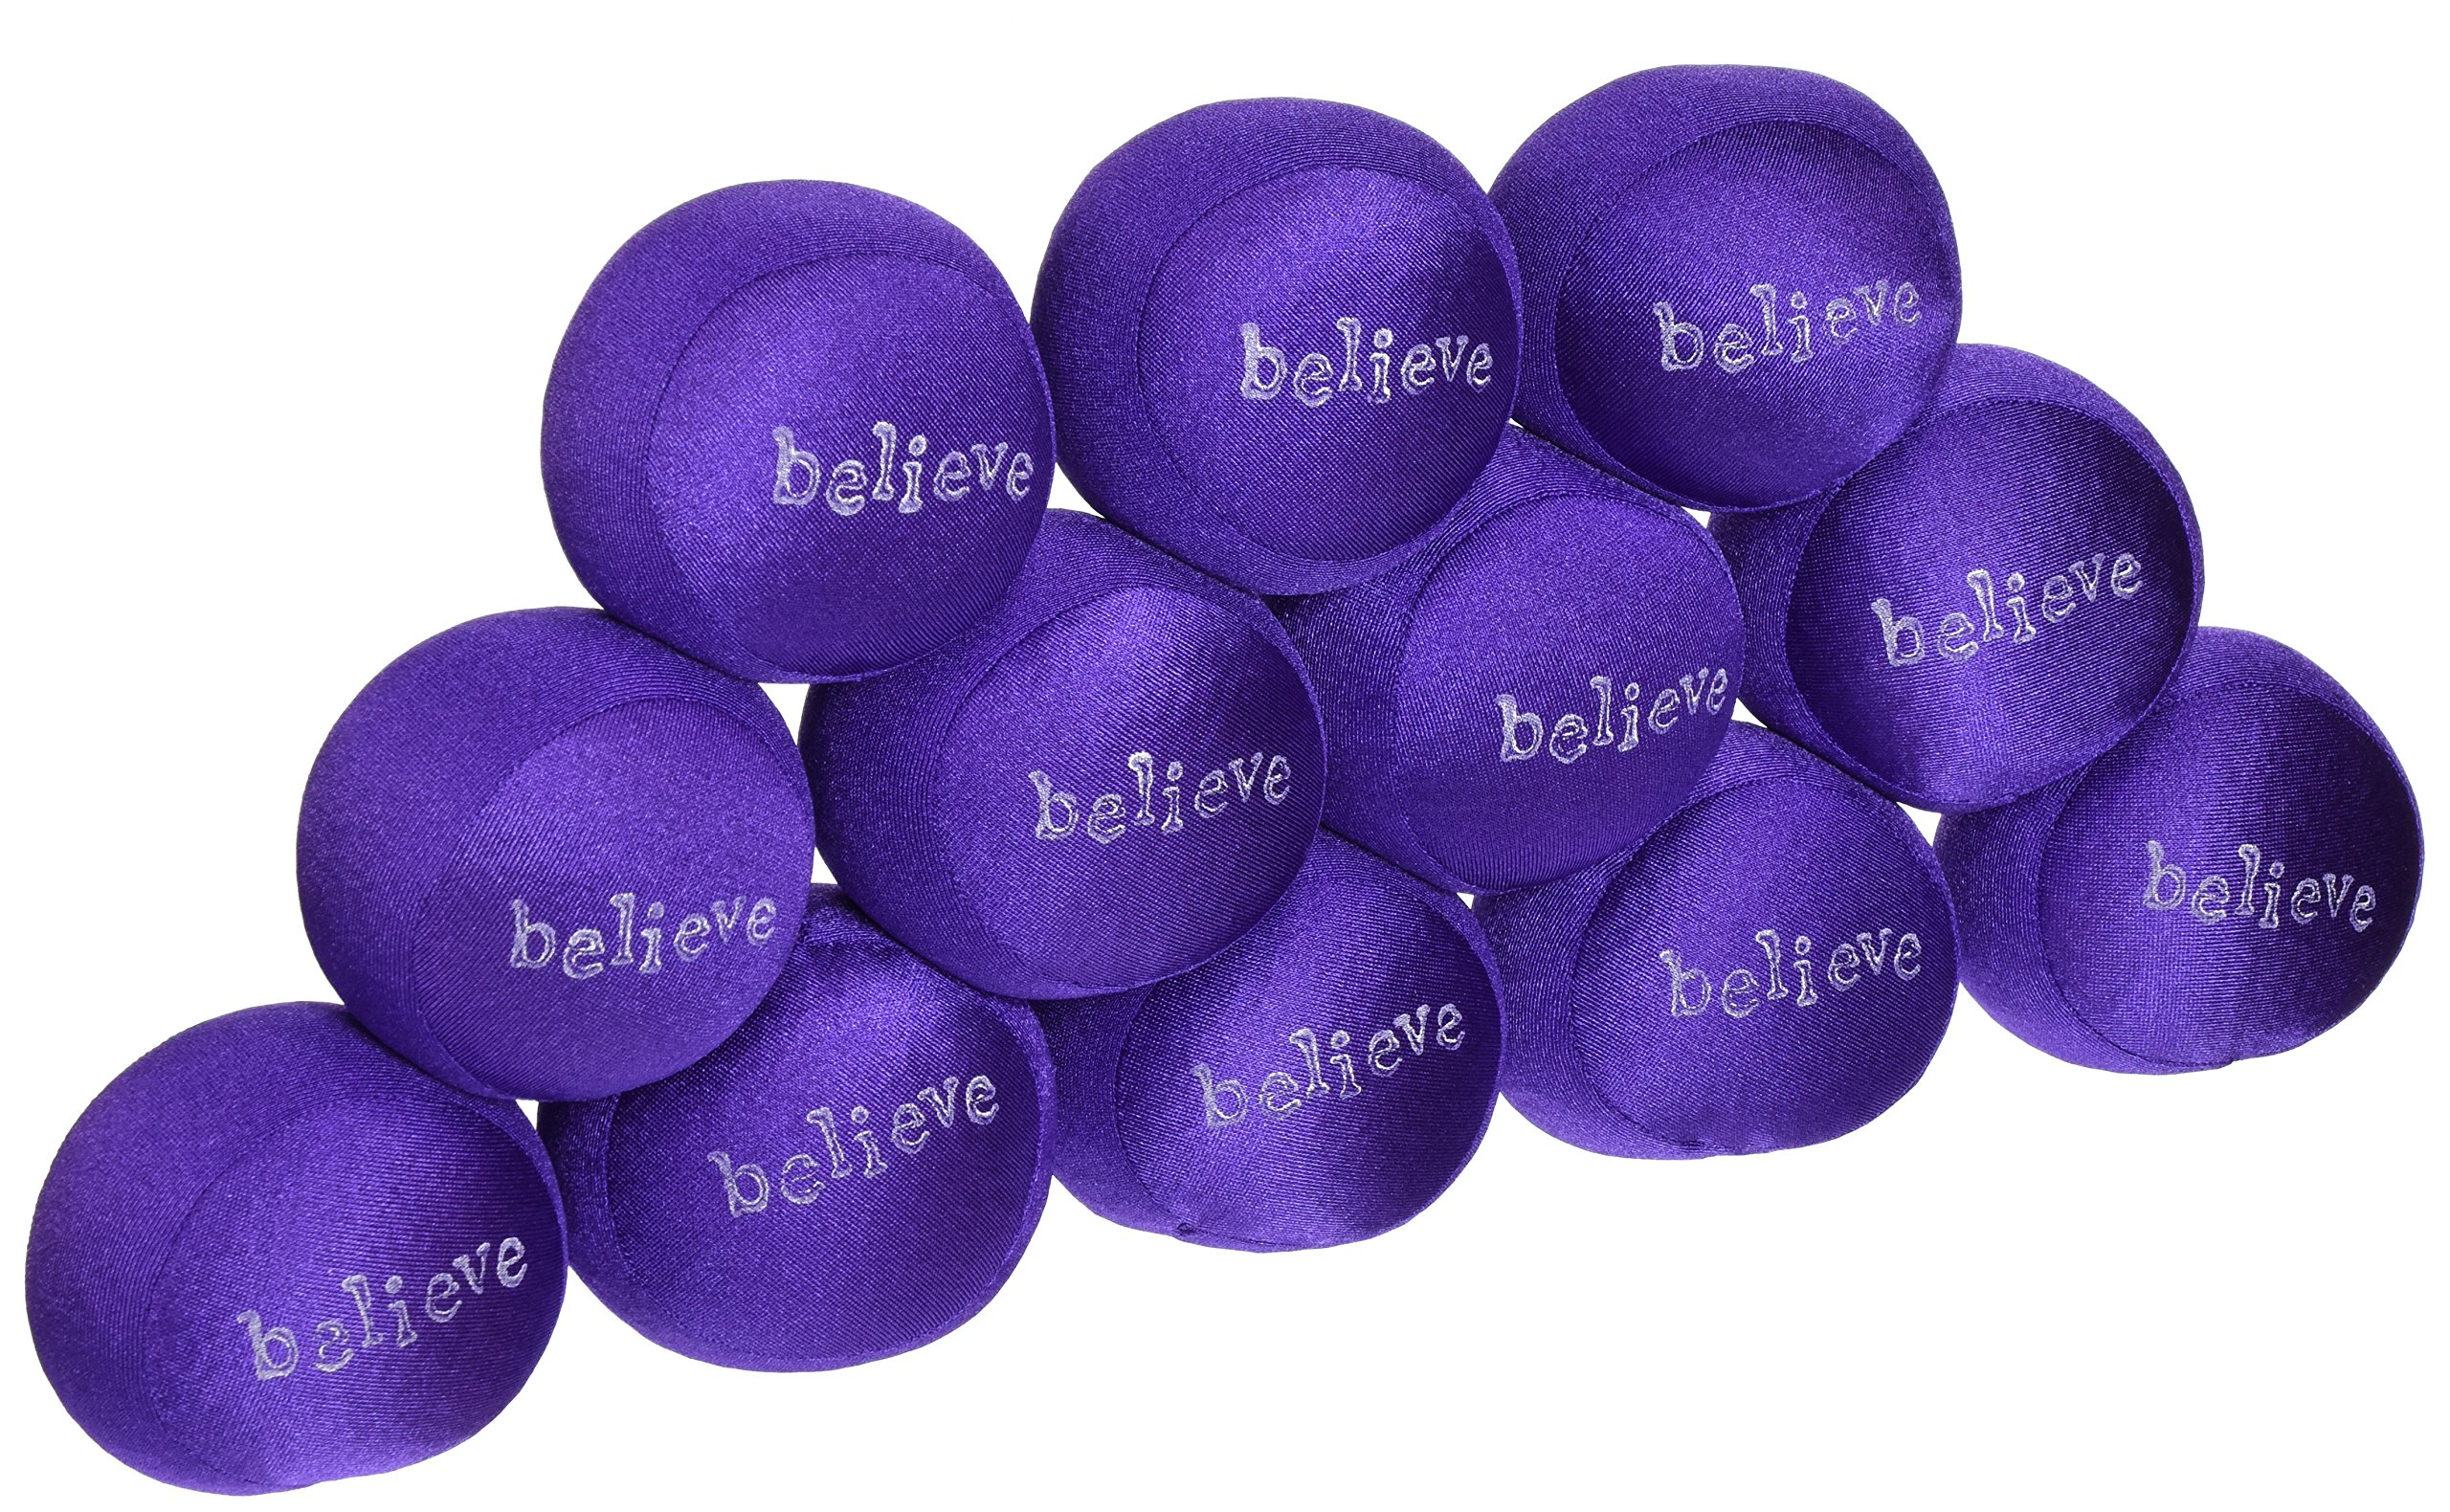 Lavender Luvies Lavender Stress Balls, Purple Believe - 12 Pack